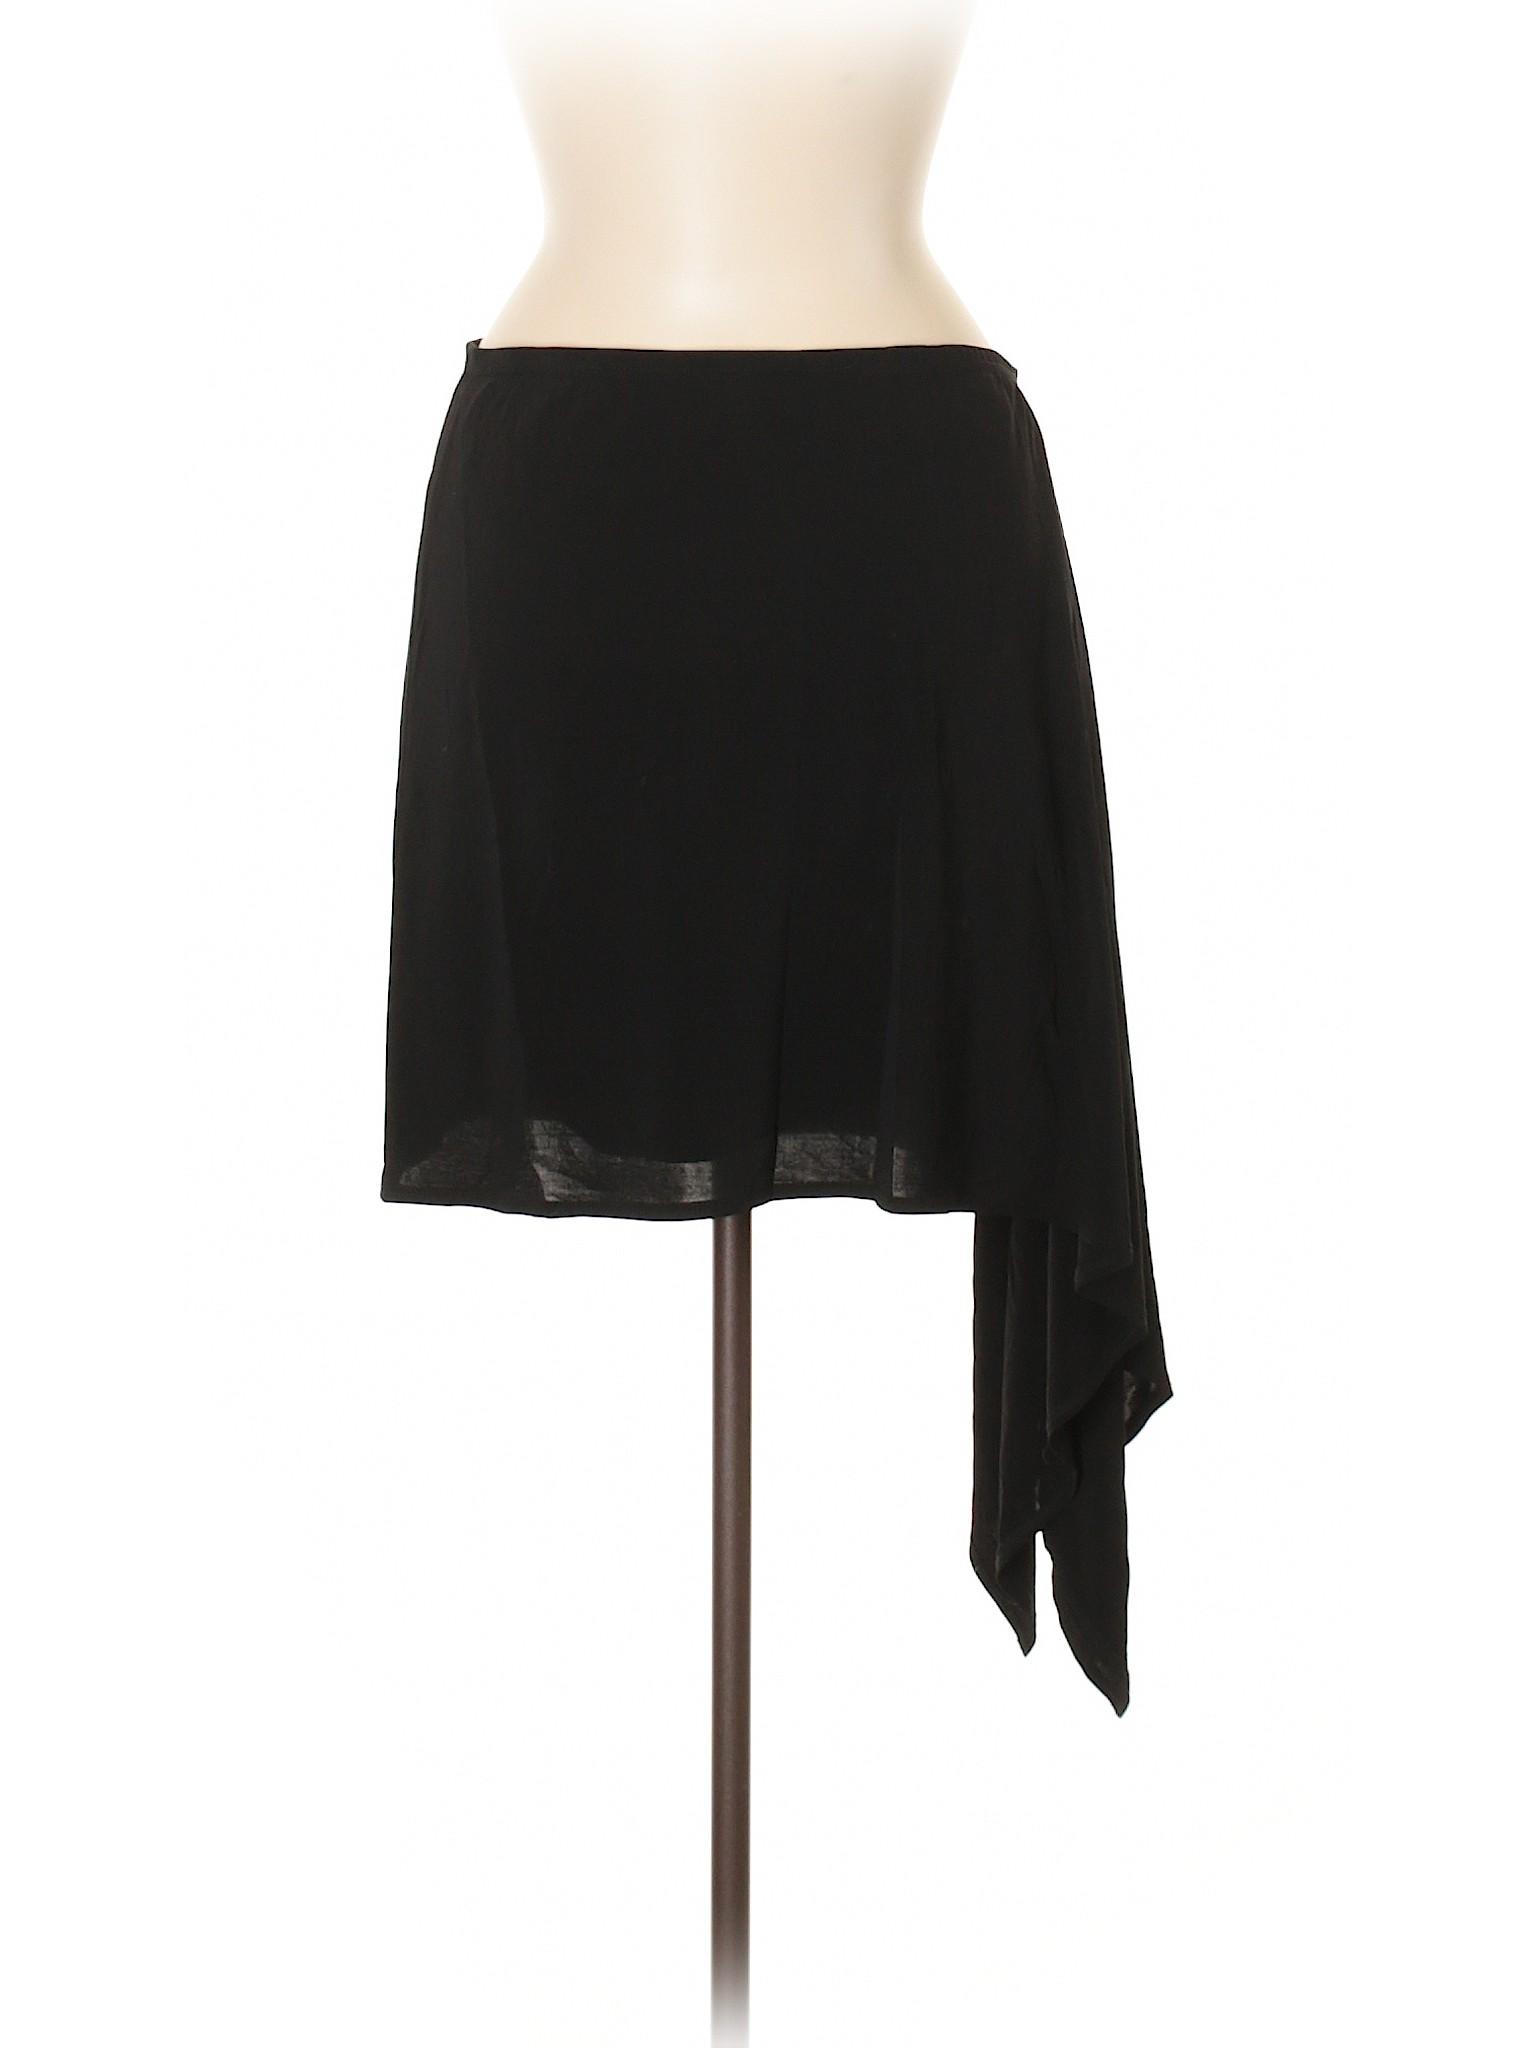 Skirt Casual Casual Casual Boutique Boutique Skirt Casual Boutique Skirt Boutique wzBx8q4zg